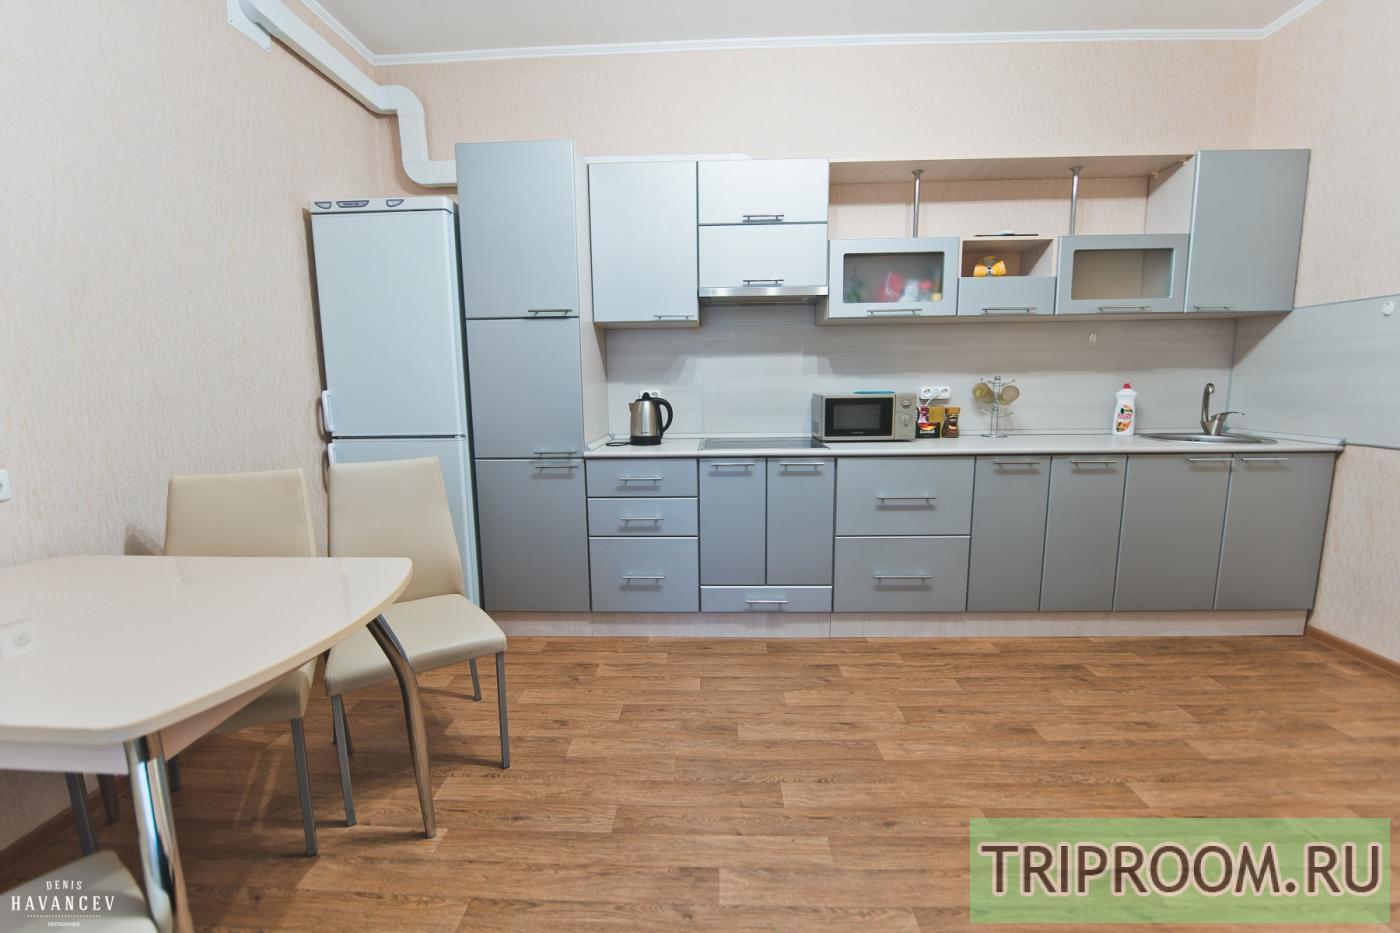 1-комнатная квартира посуточно (вариант № 14832), ул. Пугачева улица, фото № 1